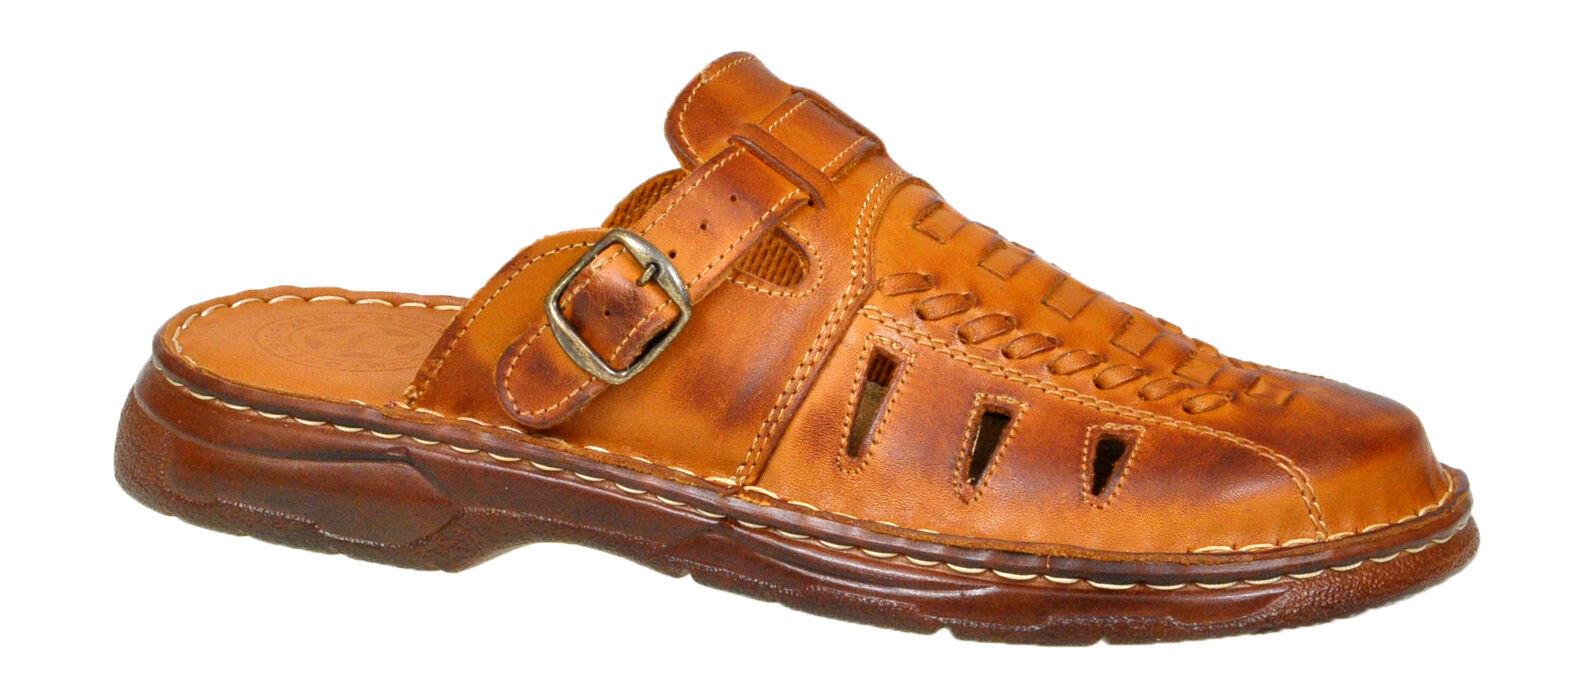 Men Genuine Buffalo Leather Orthopedic Sandals Slip On ...